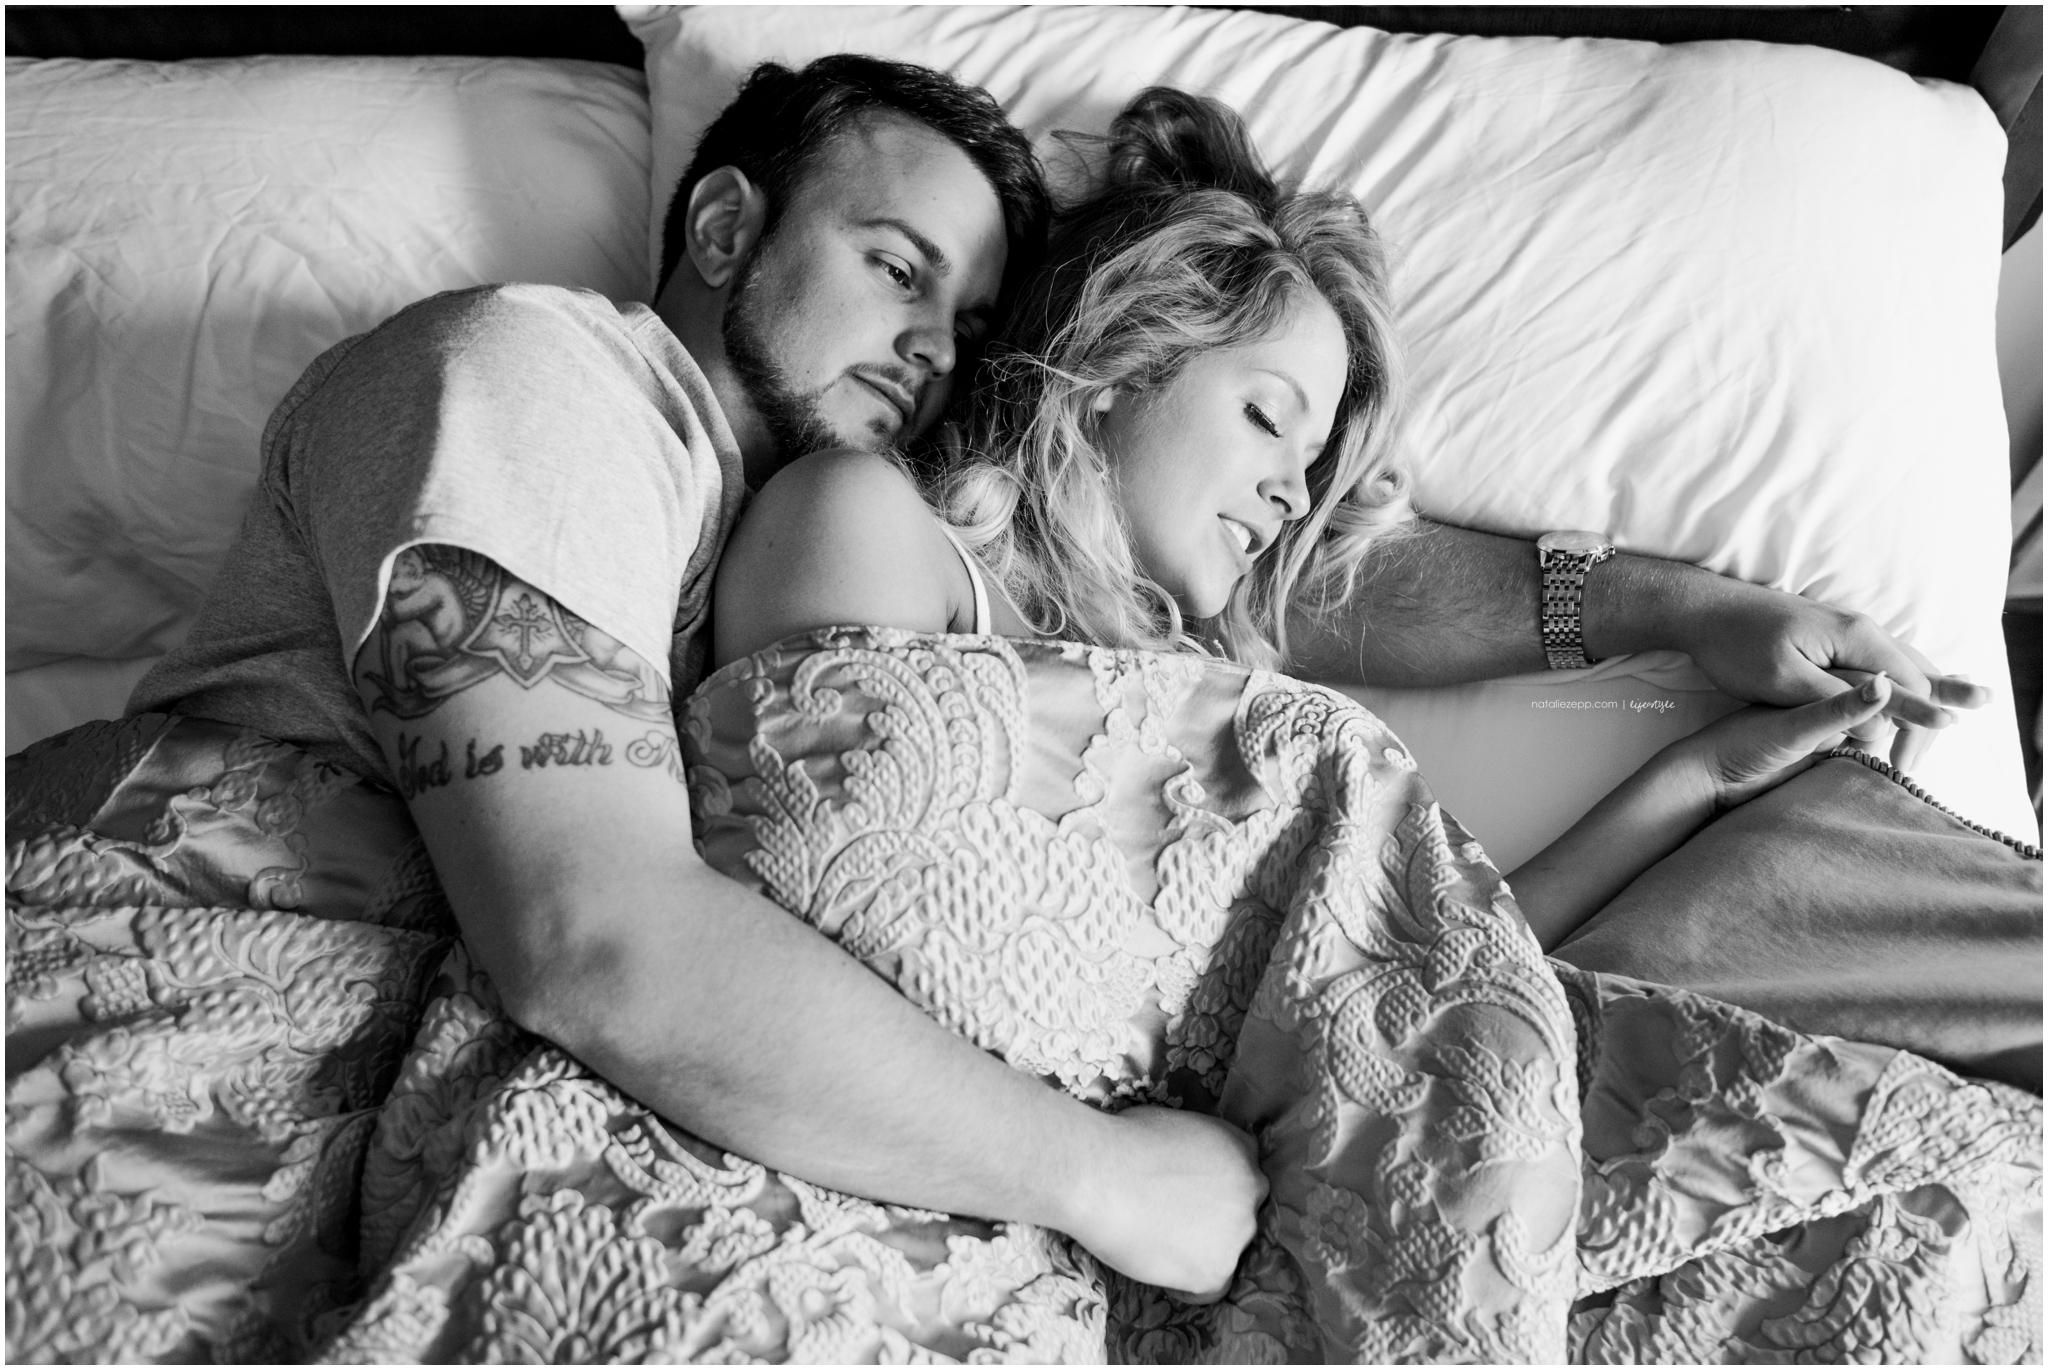 Honeymoon Photographer, Honeymoon lifestyle photographer, newlywed photographer, New World Inn, New World Landing, Pensacola FL